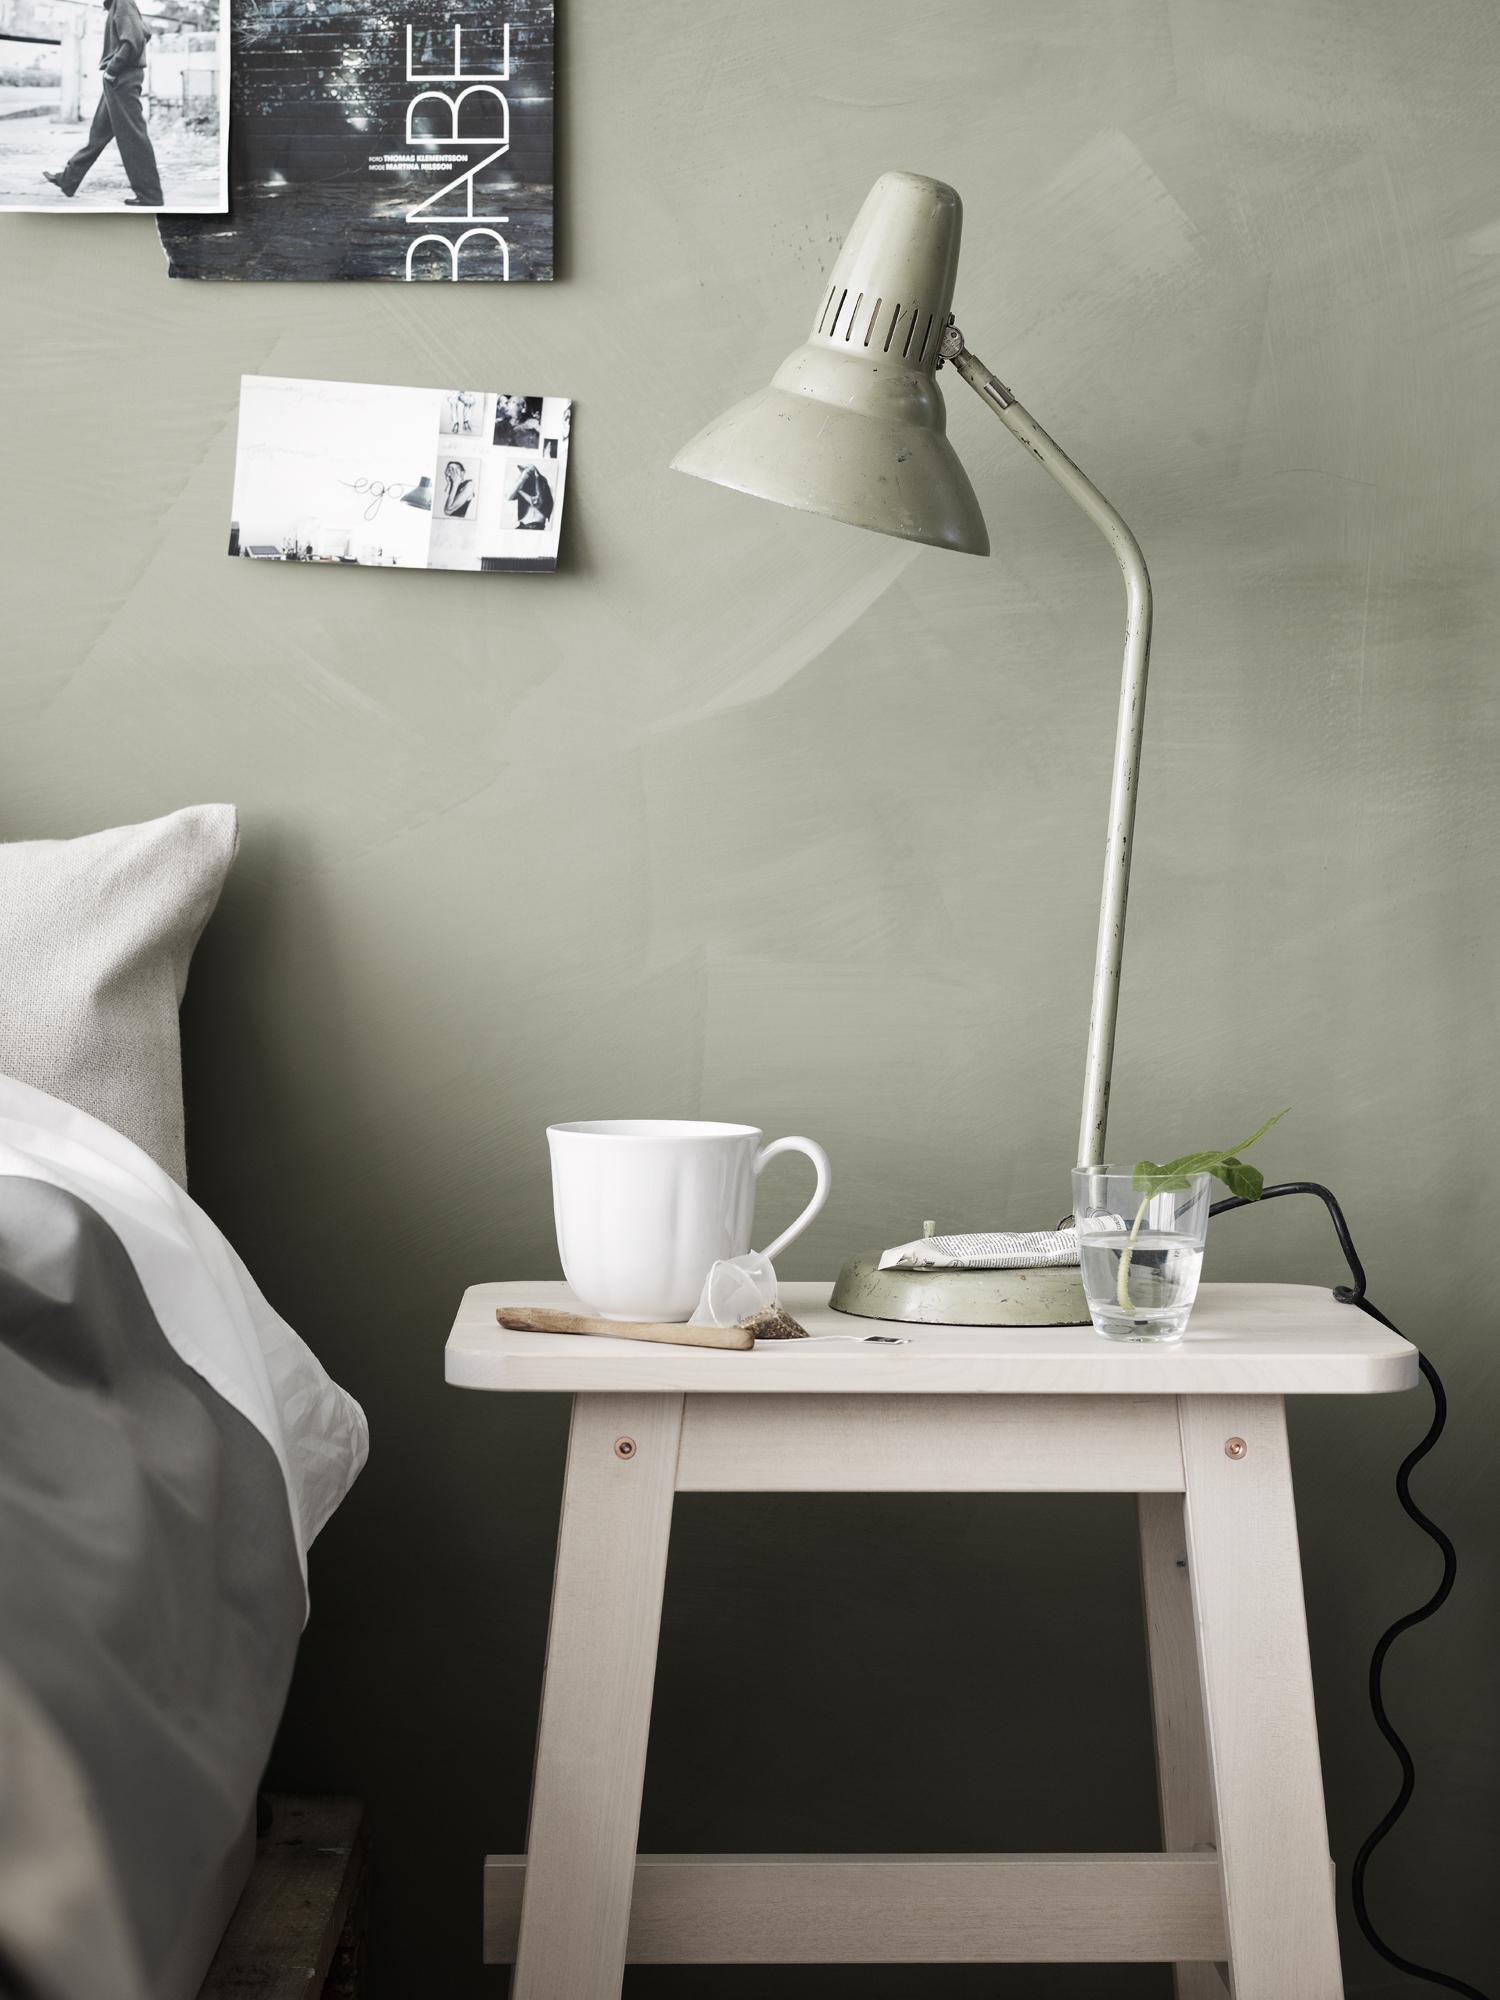 Ikea_10045.jpg